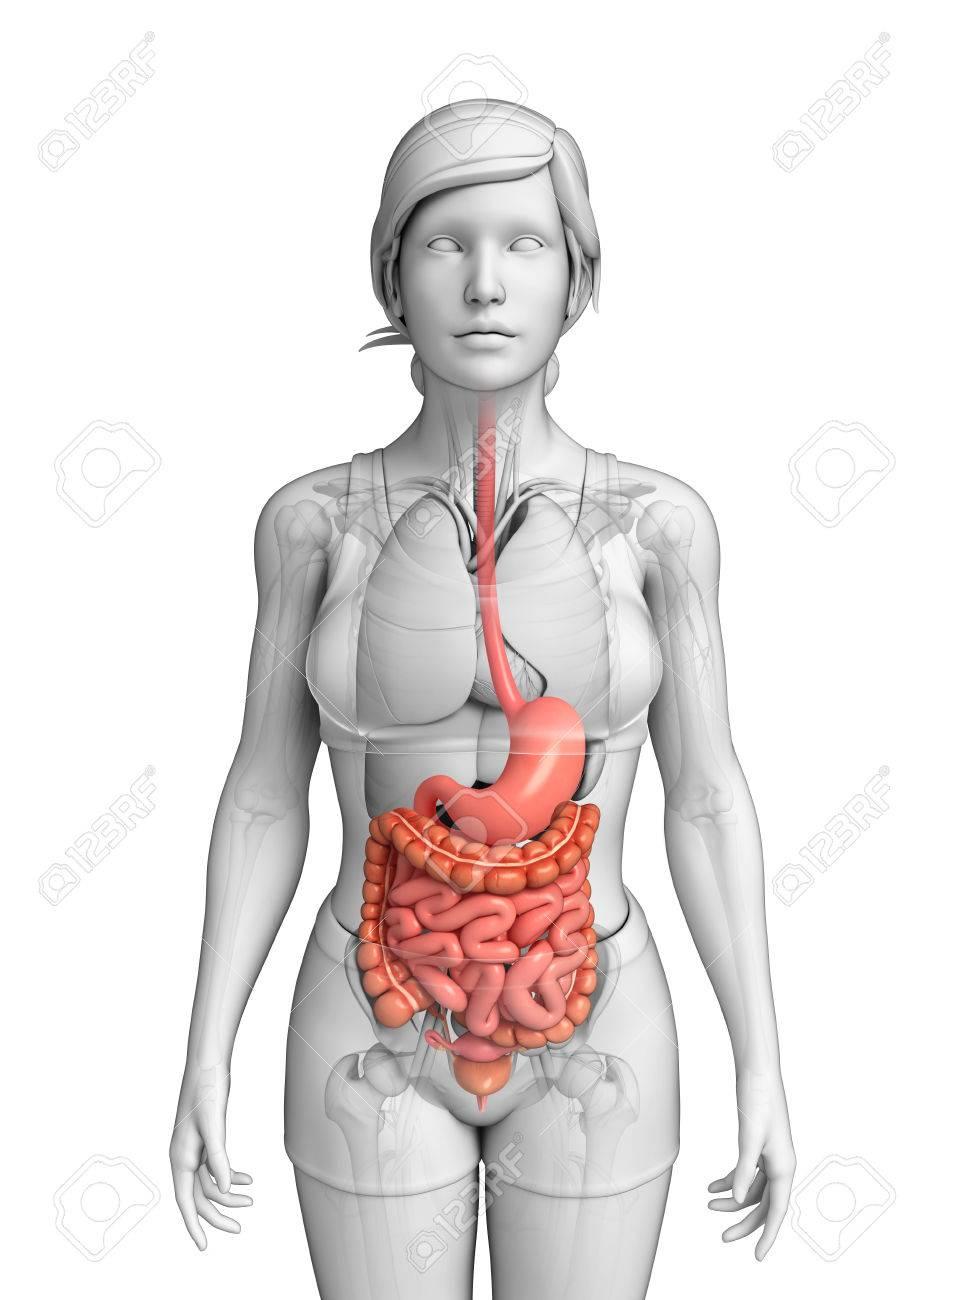 Illustration Of Female Small Intestine Anatomy Stock Photo, Picture ...